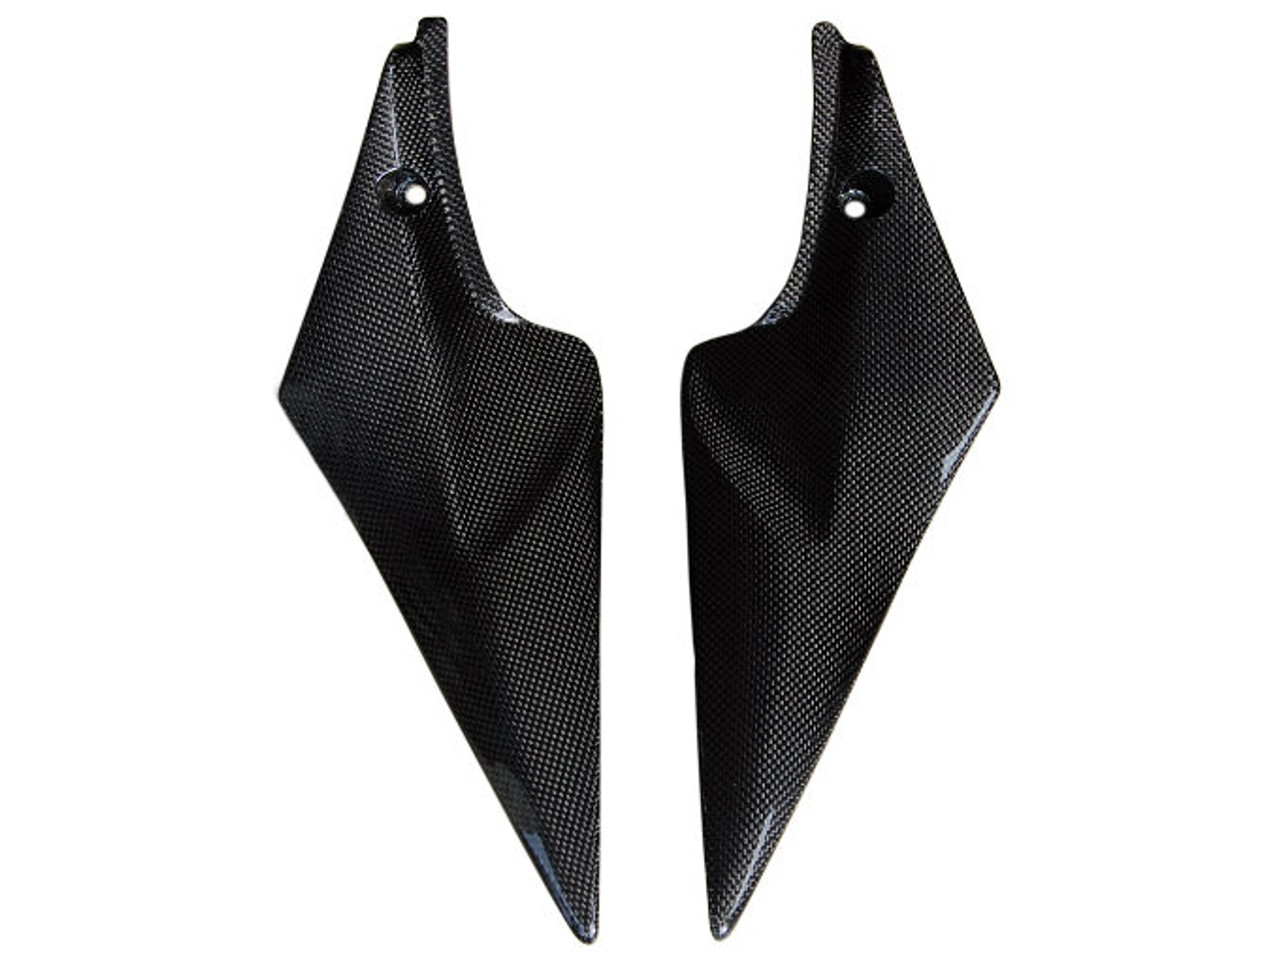 Glossy Plain Weave Carbon Fiber  Tank Side Panels for Suzuki  GSXR 600, GSXR 750  2006-2007